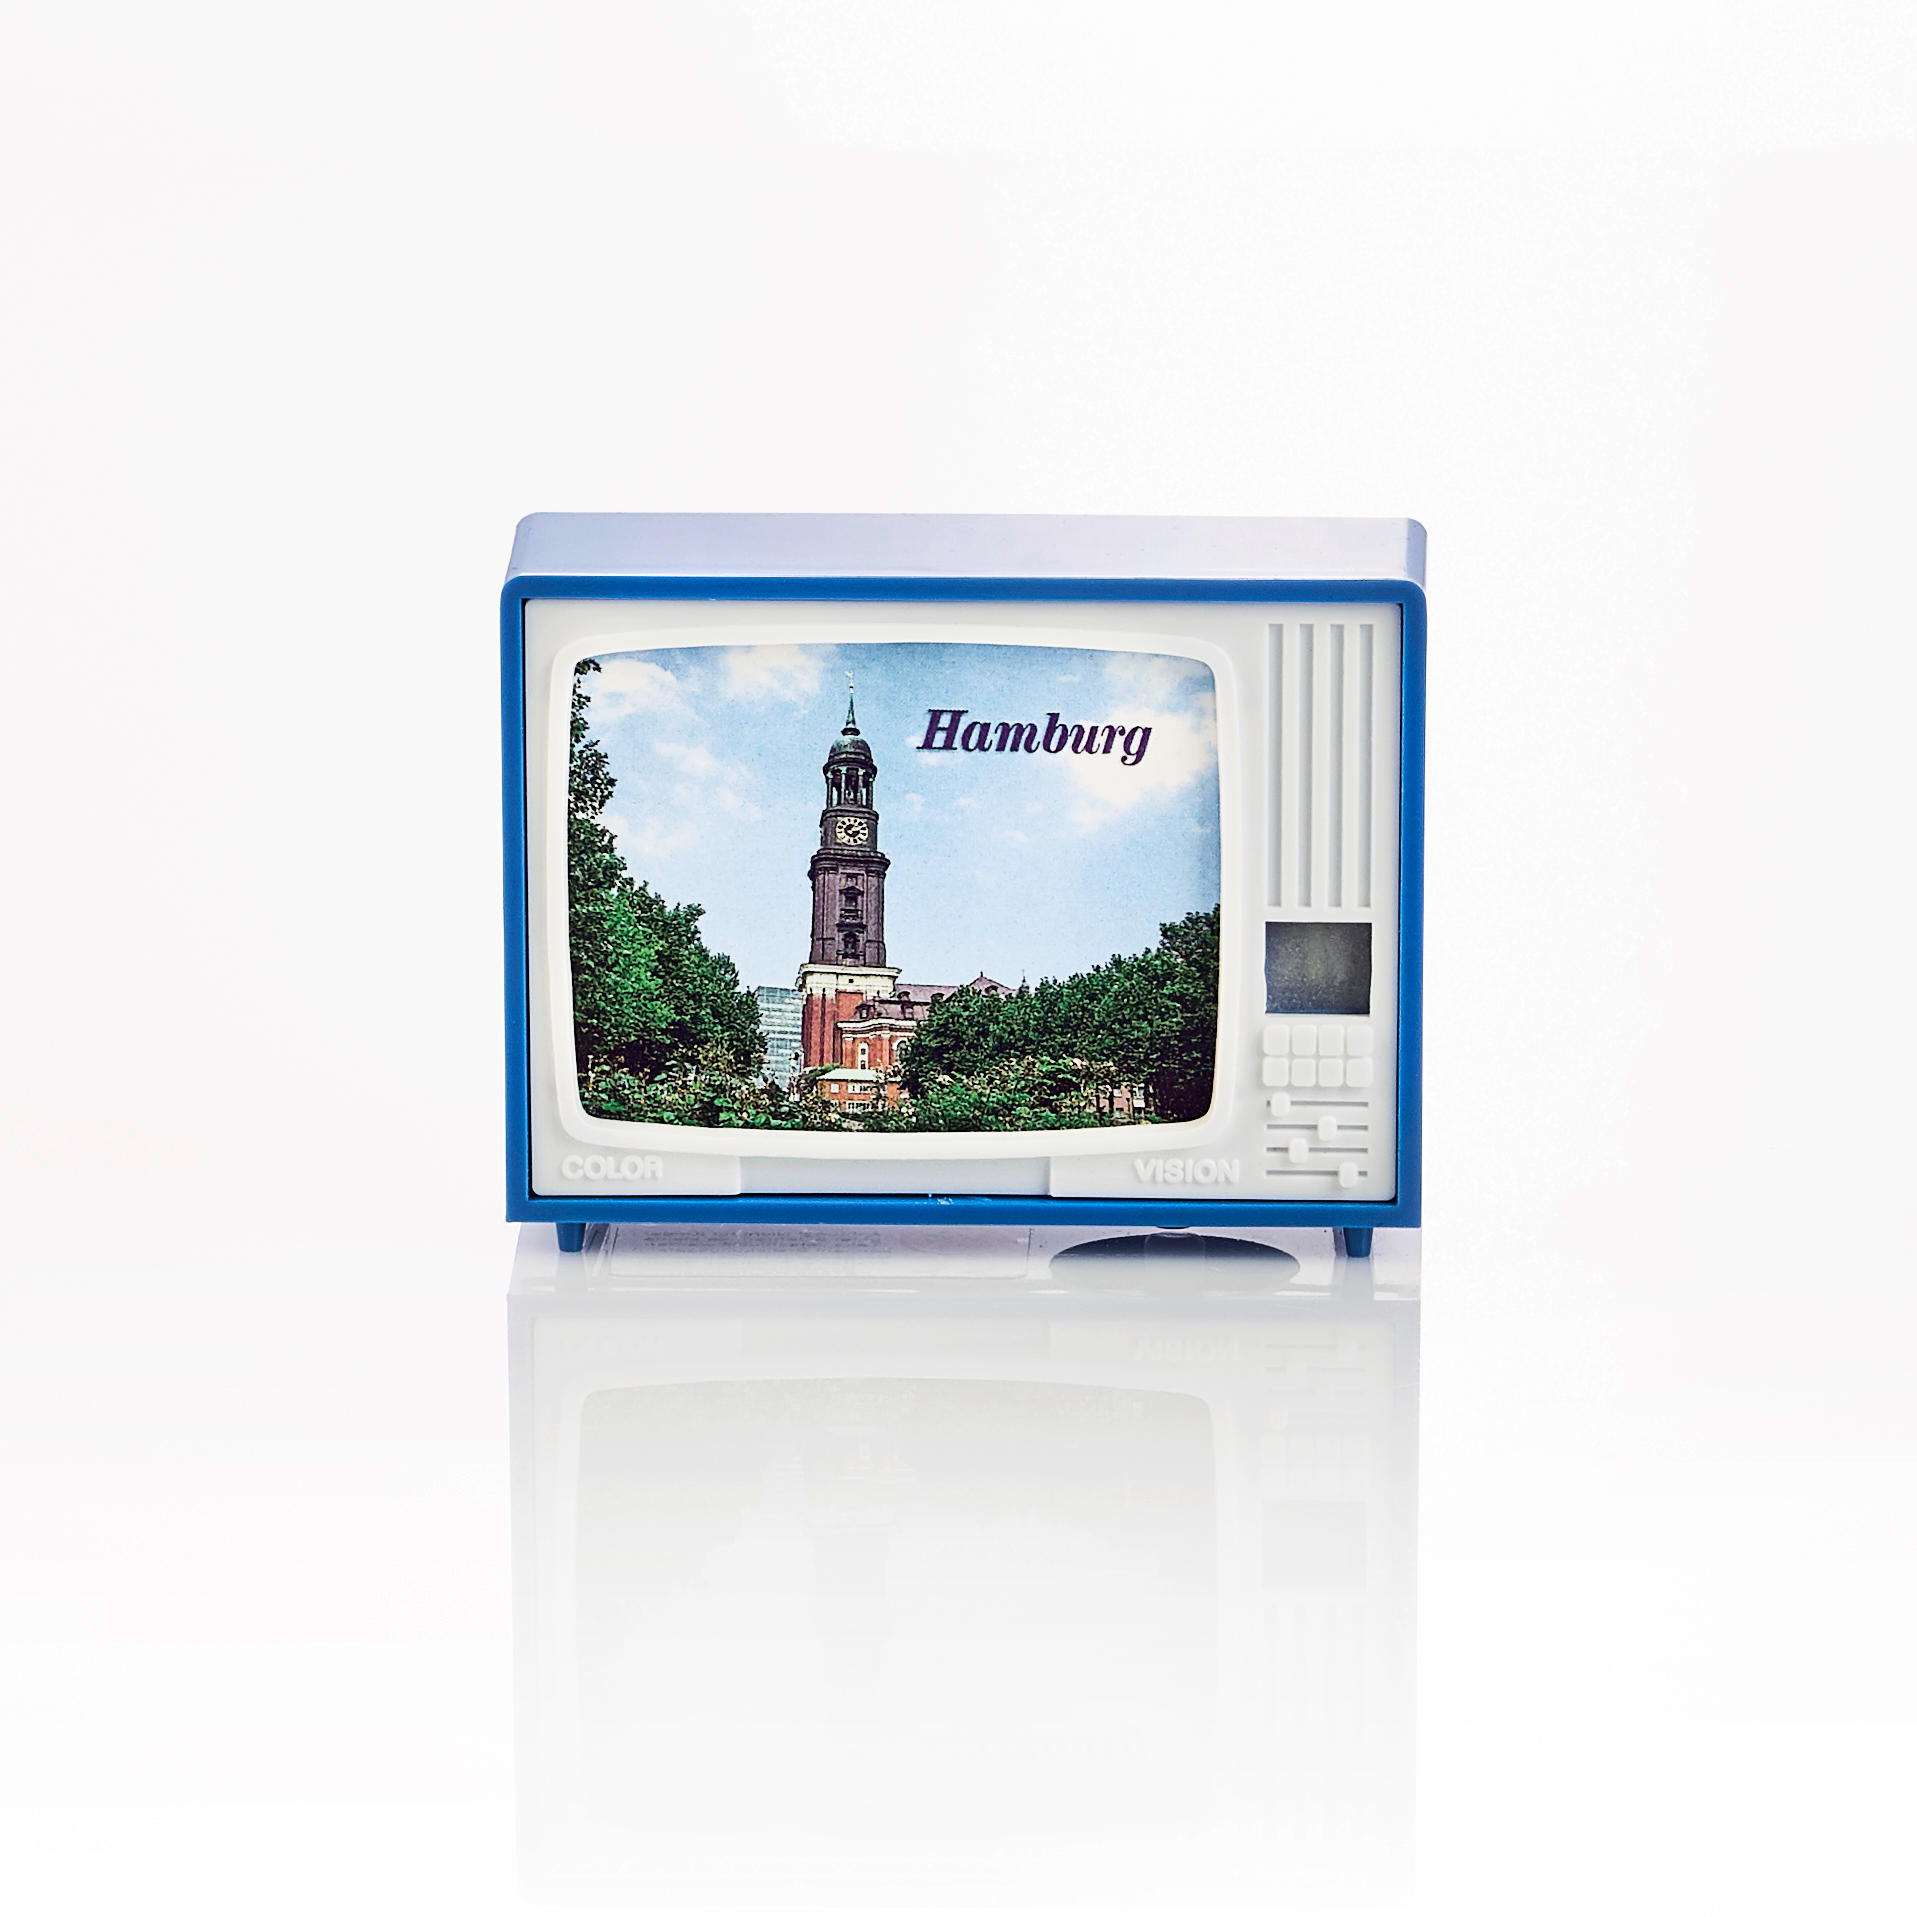 Mini-Fernseher retro